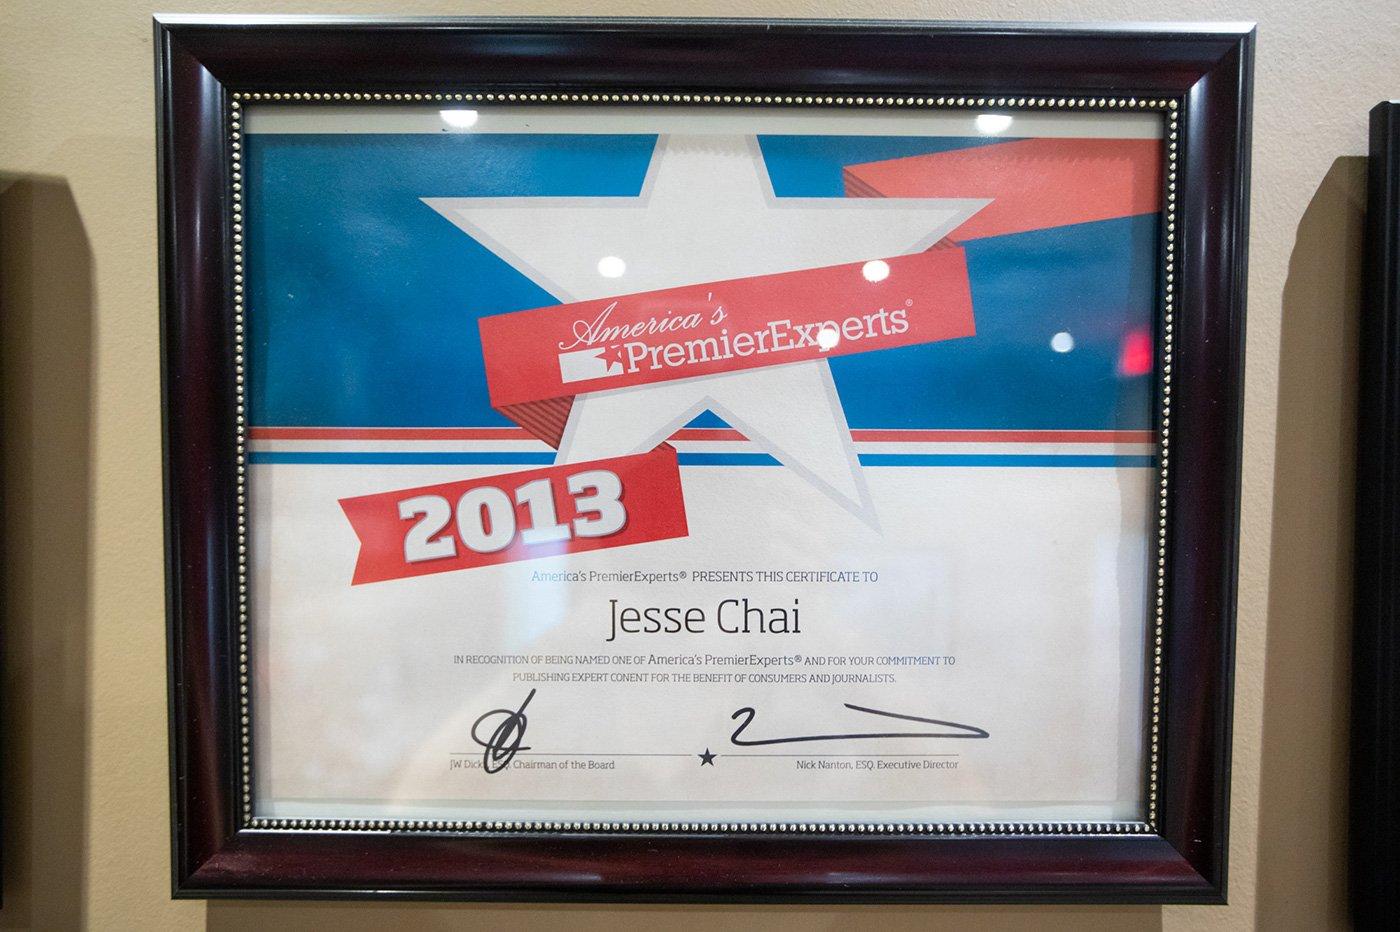 Jesse Chai - America's Premier Experts Award